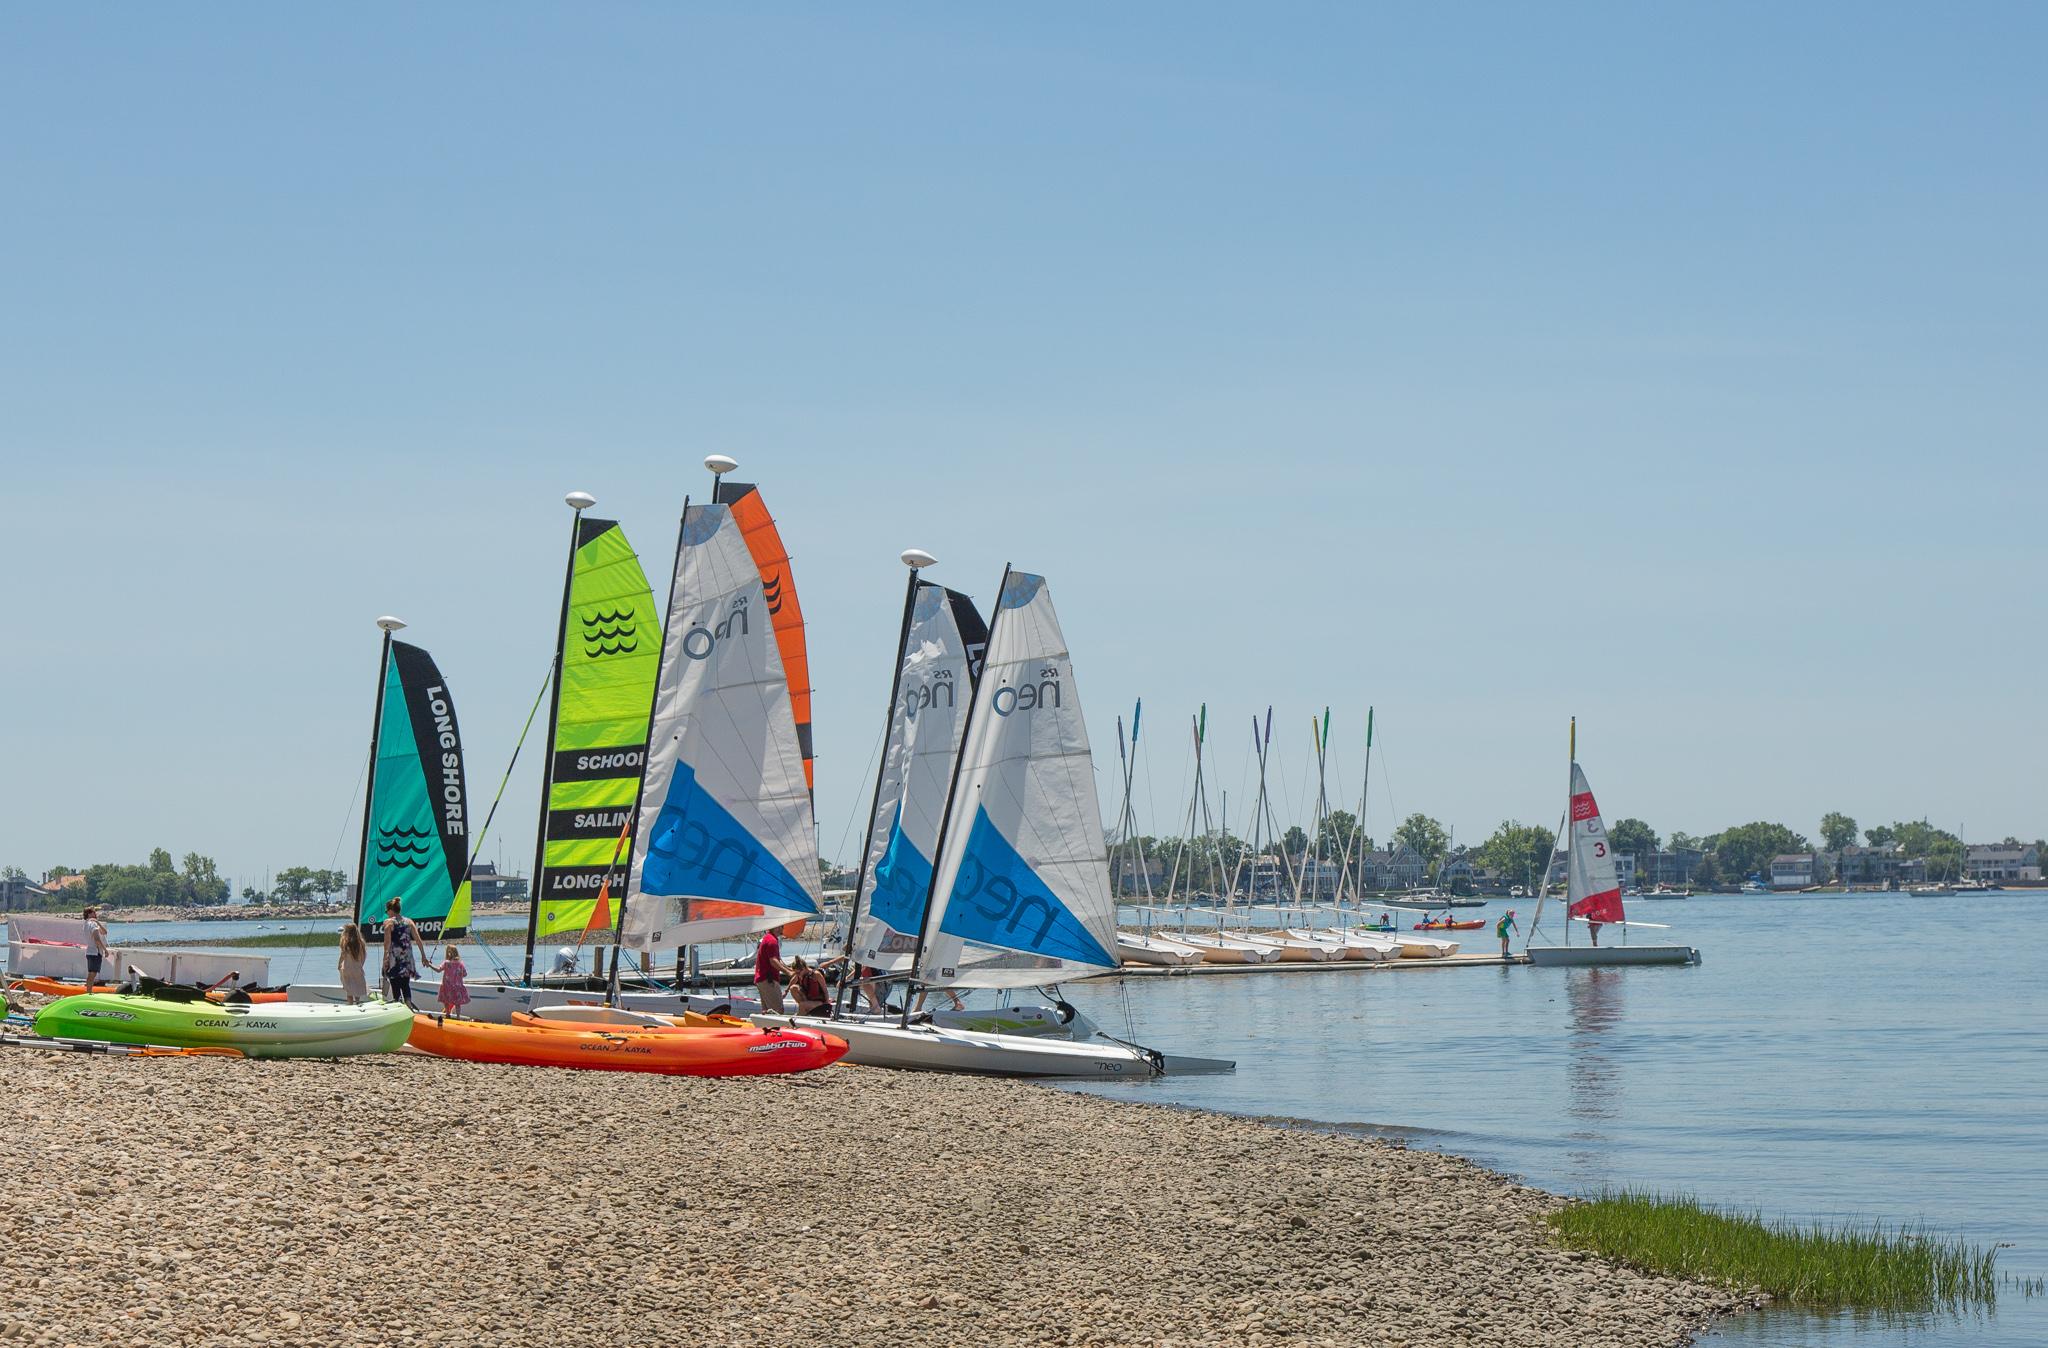 25 sailing sch 2 .jpg